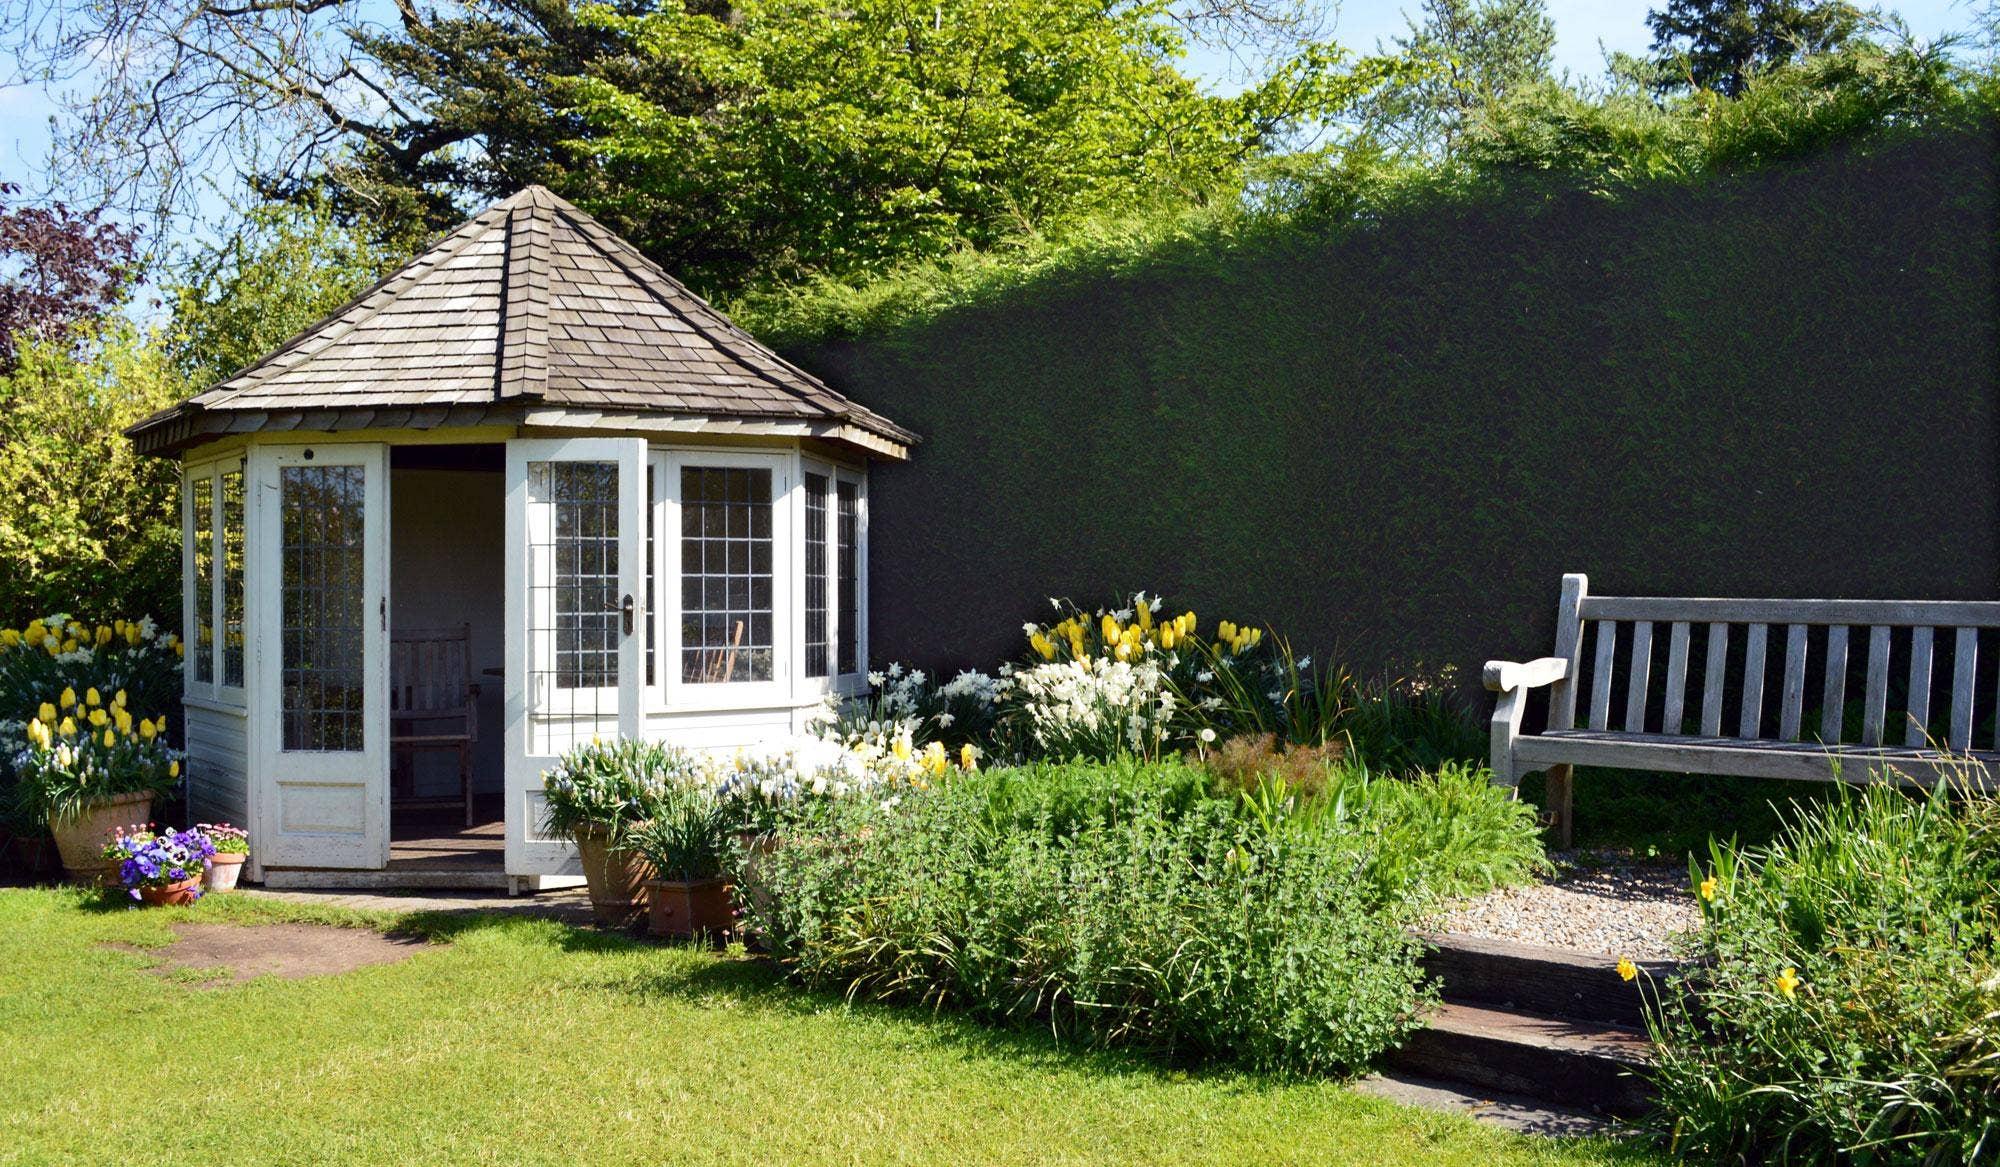 Garden Shed Ideas for Small Home Gardens